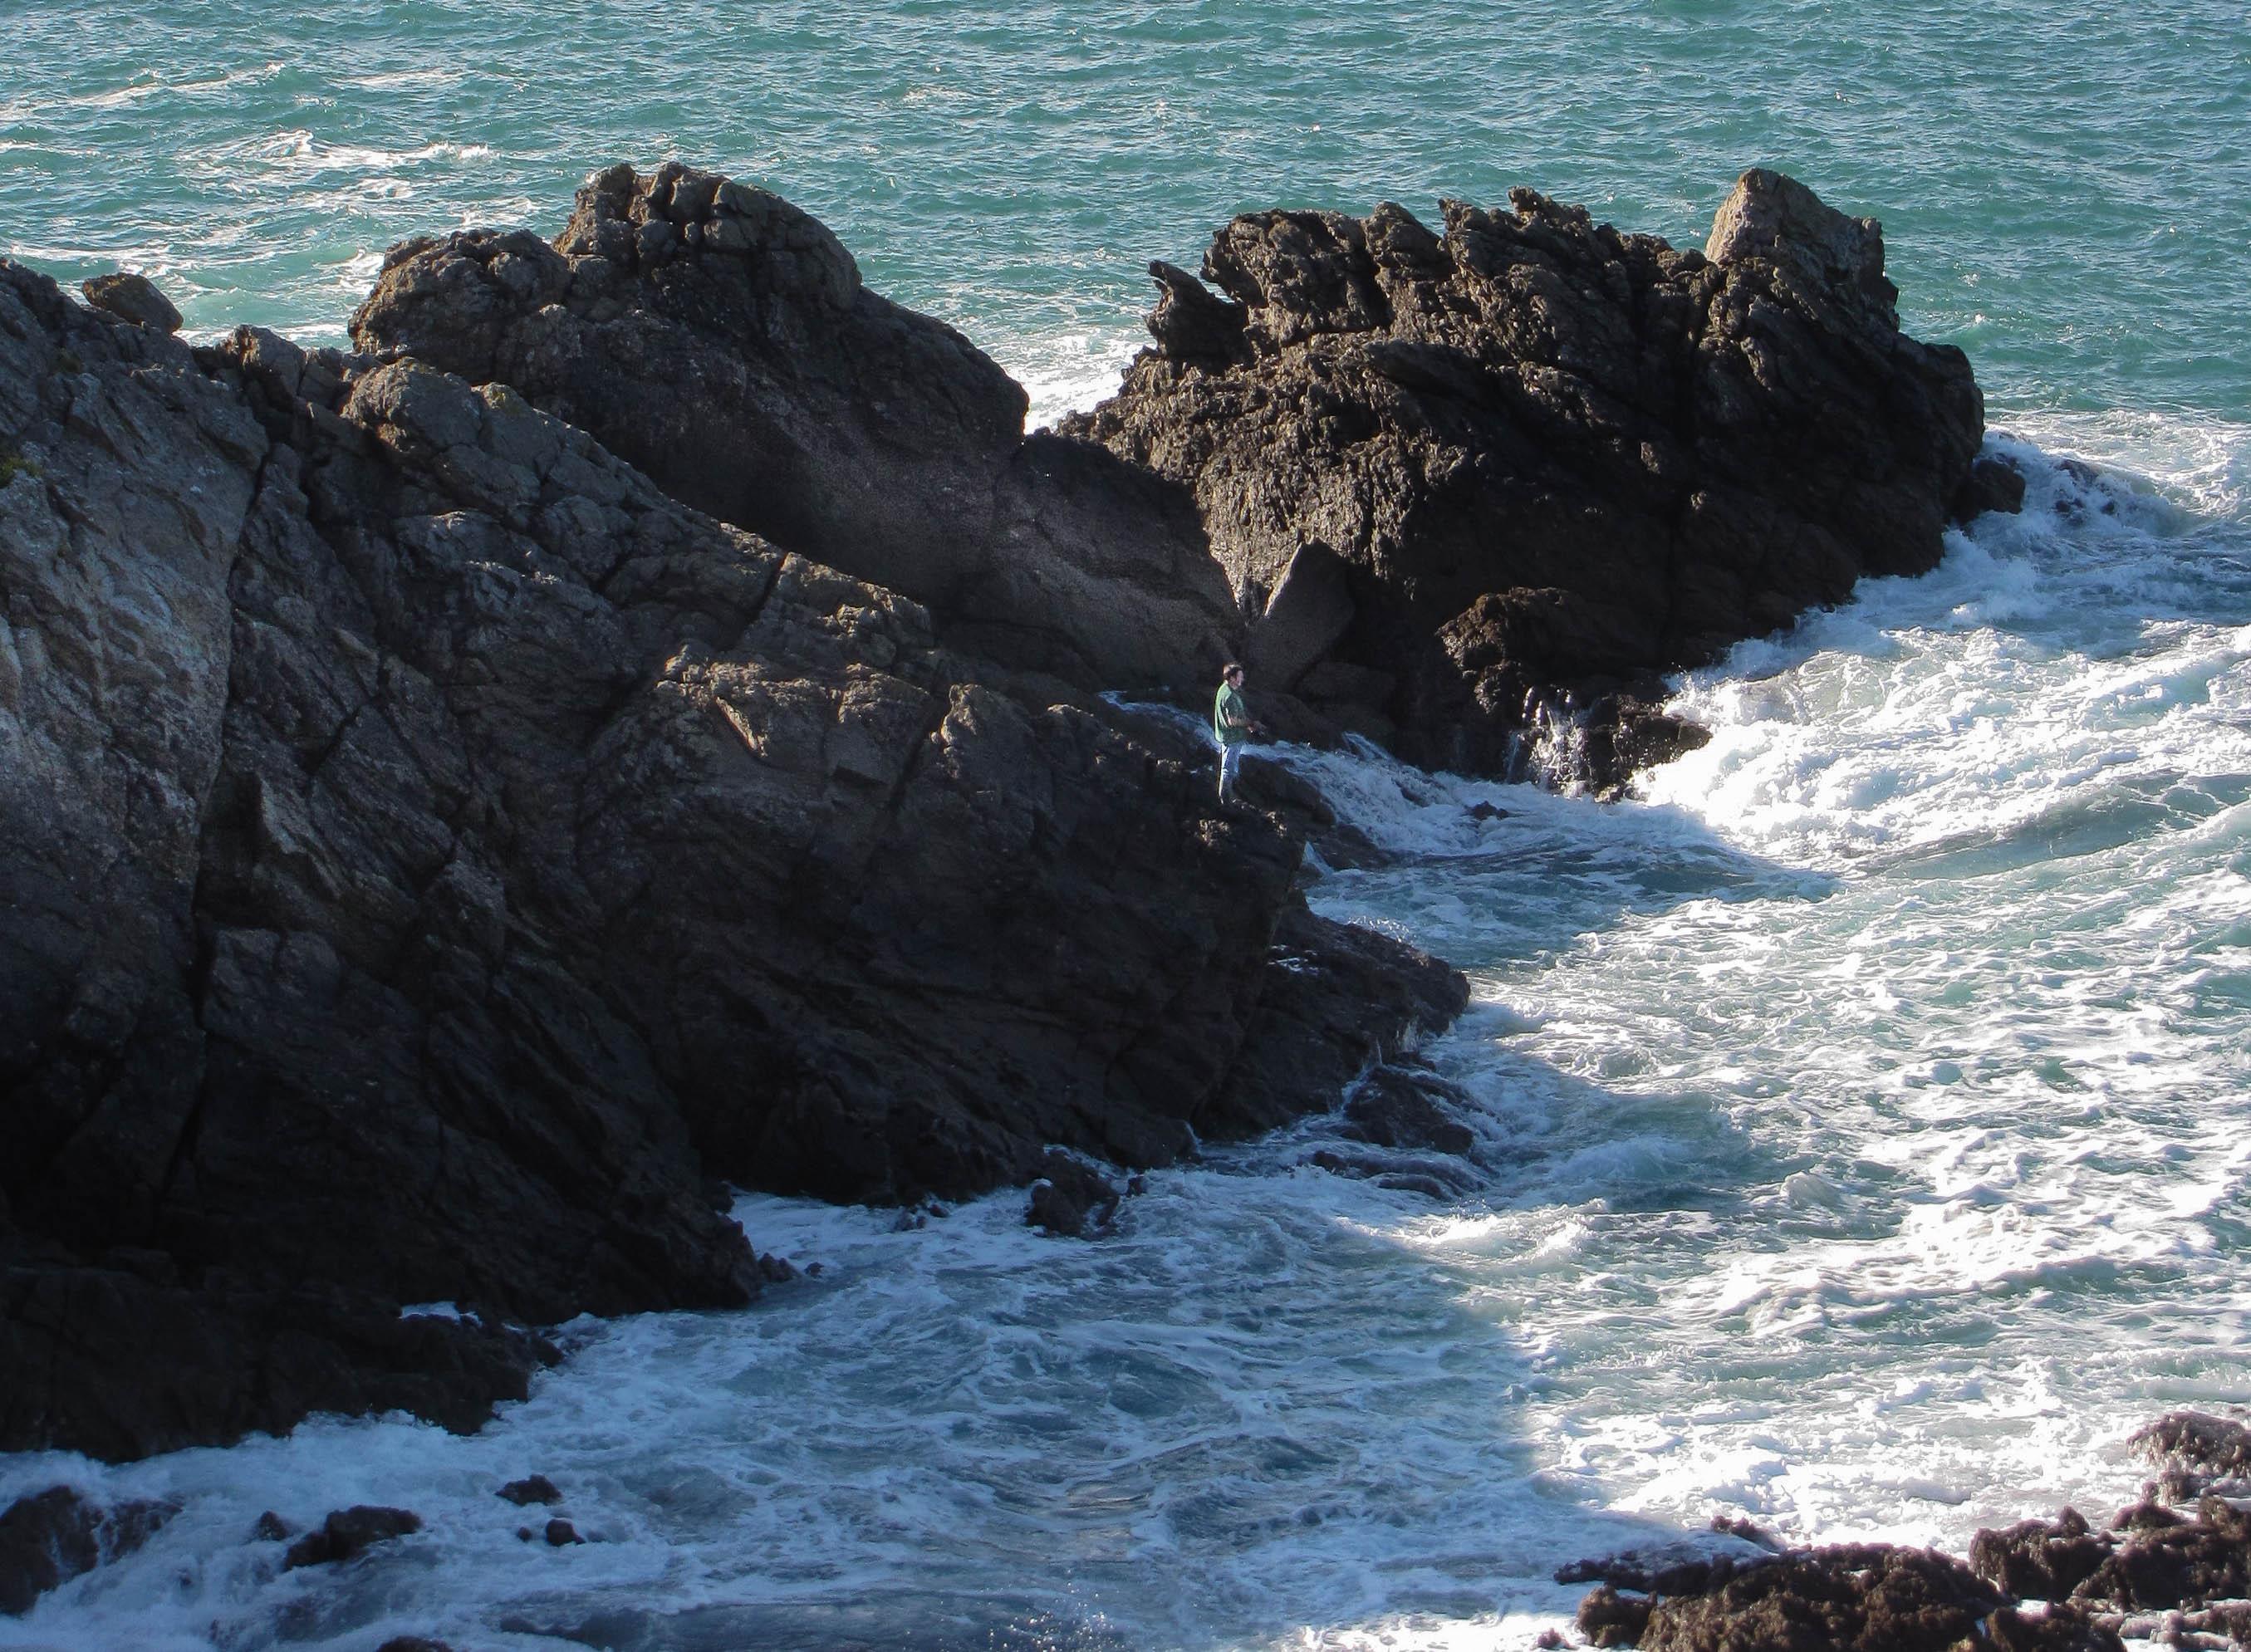 le pêcheur de l'Ile besnard 1 nov 10 14h36.jpg